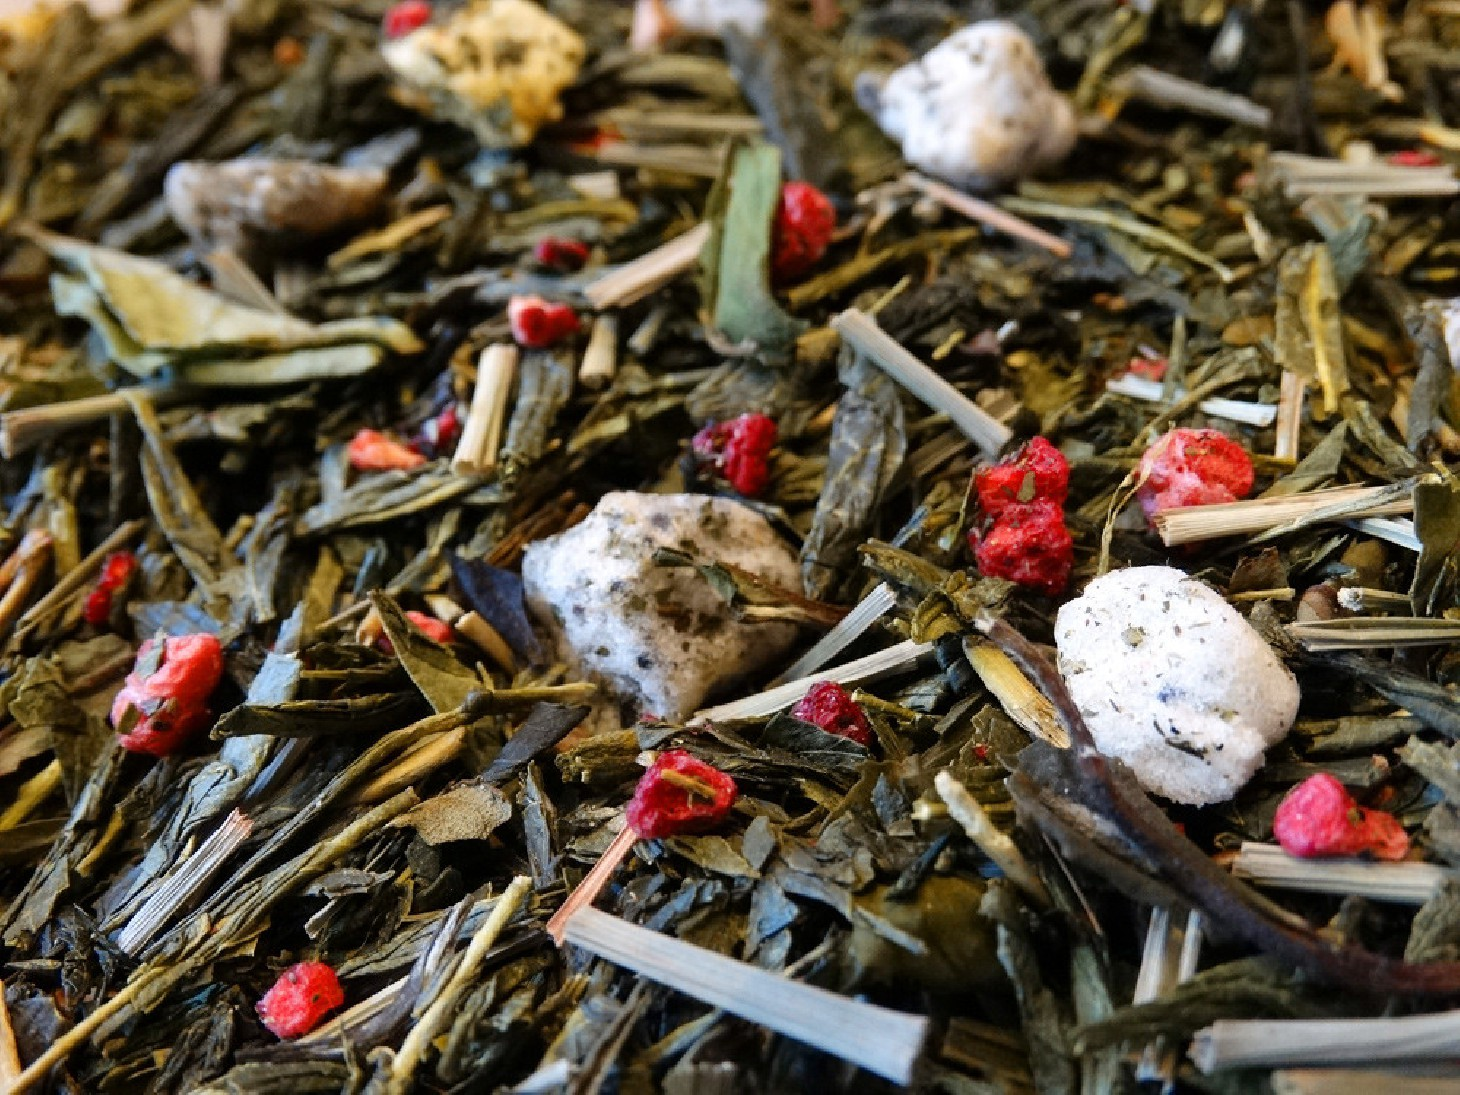 thé vert et blanc aromatisé Habana Bay fruit du dragon pittaya tea et cie